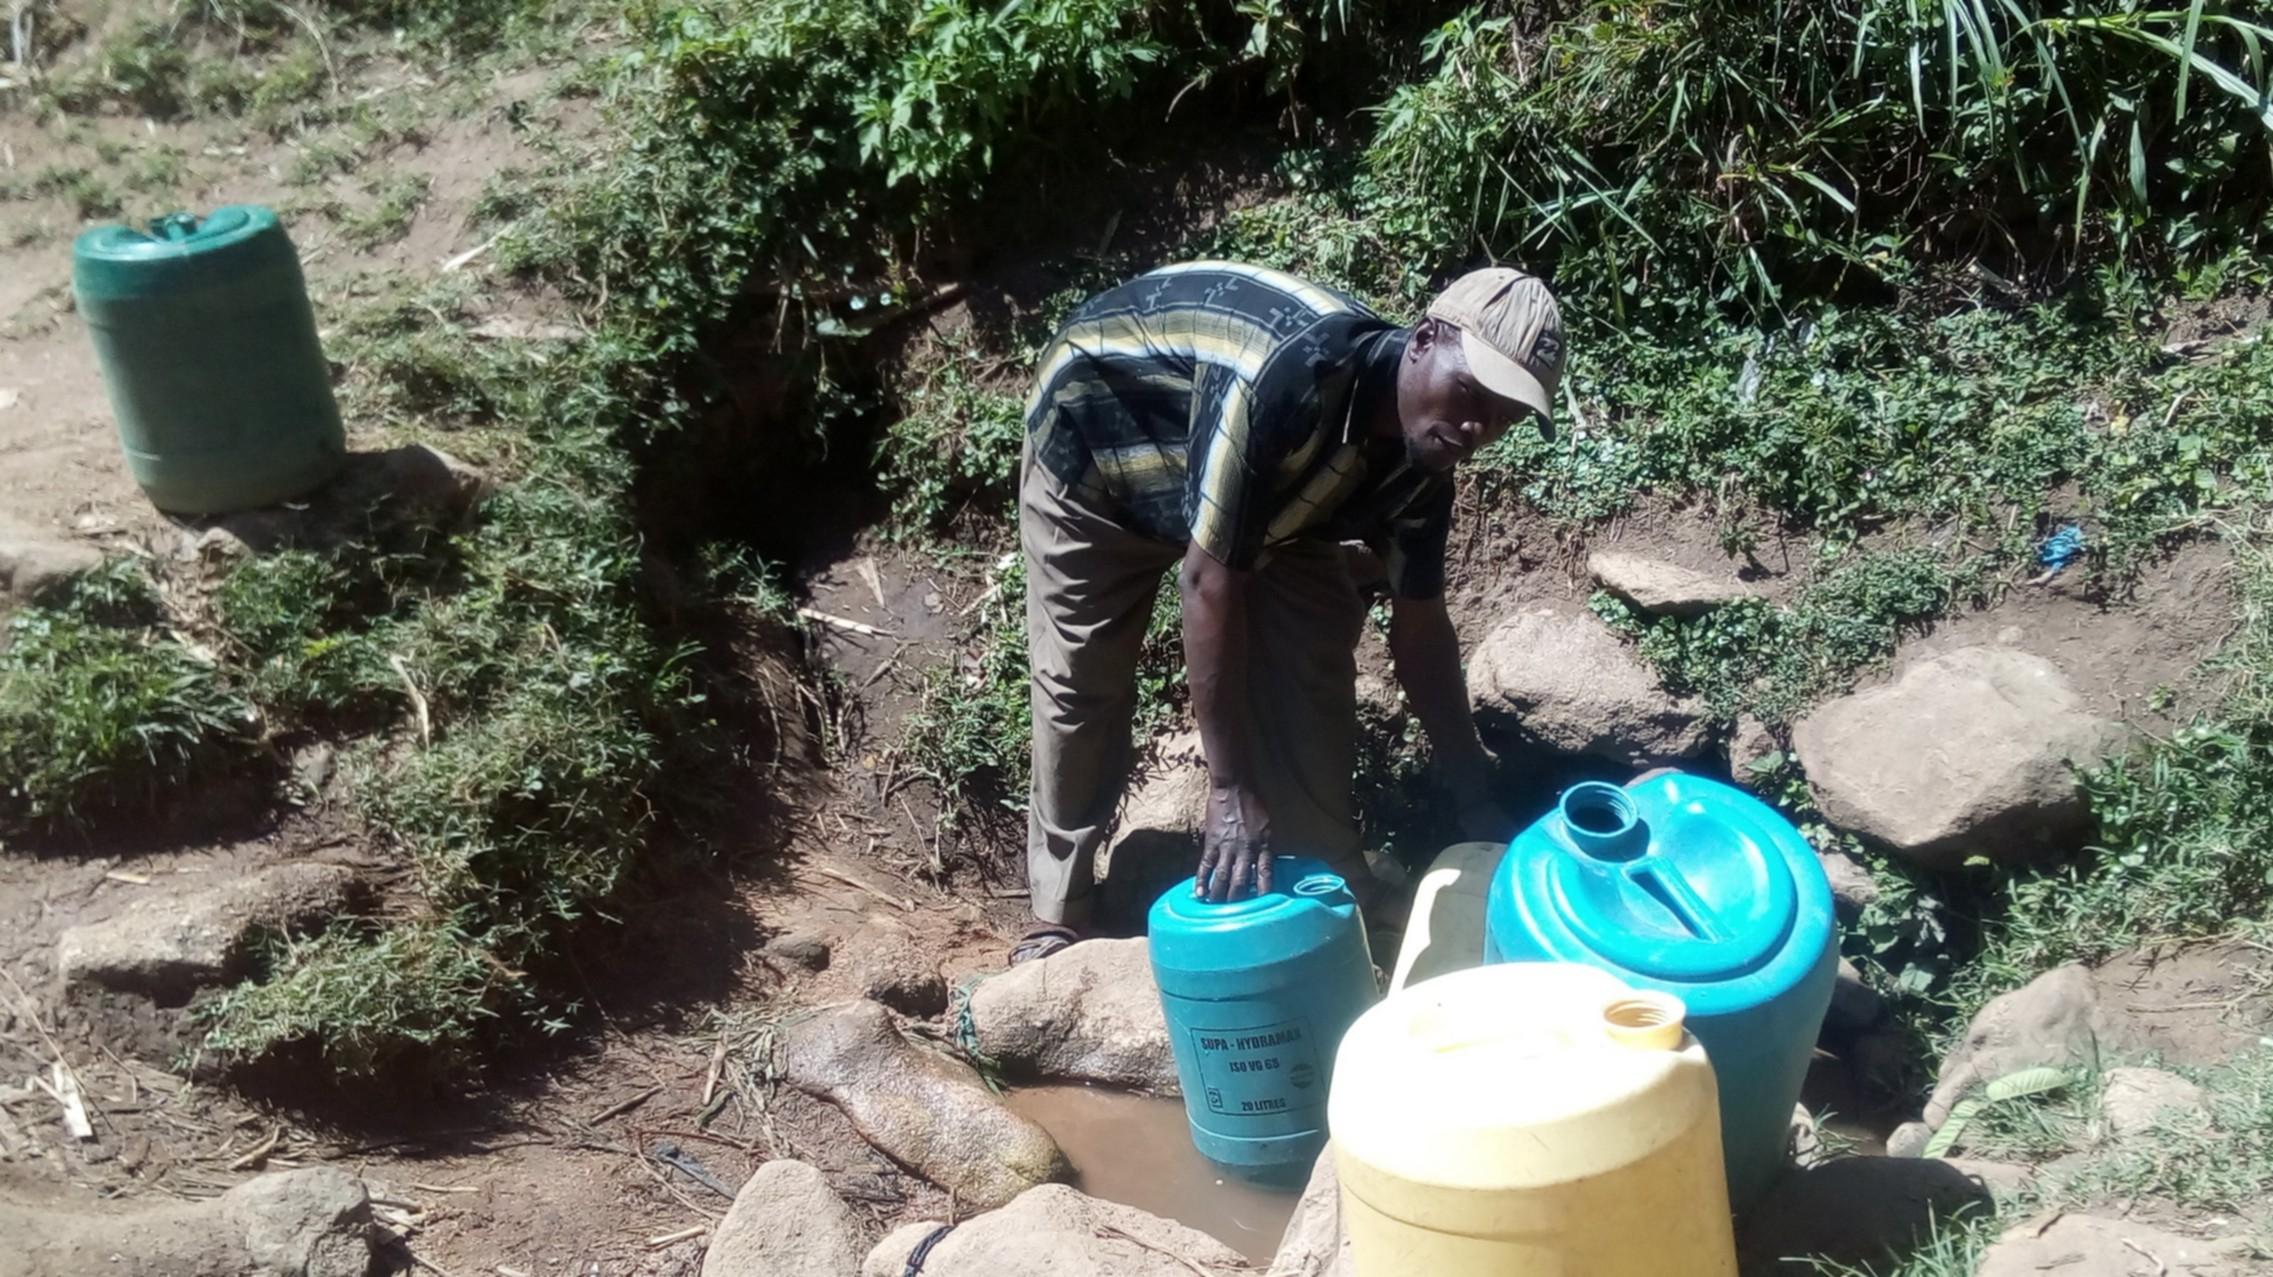 The Water Project : 1-kenya4739-zablon-fetching-water-at-matunda-spring